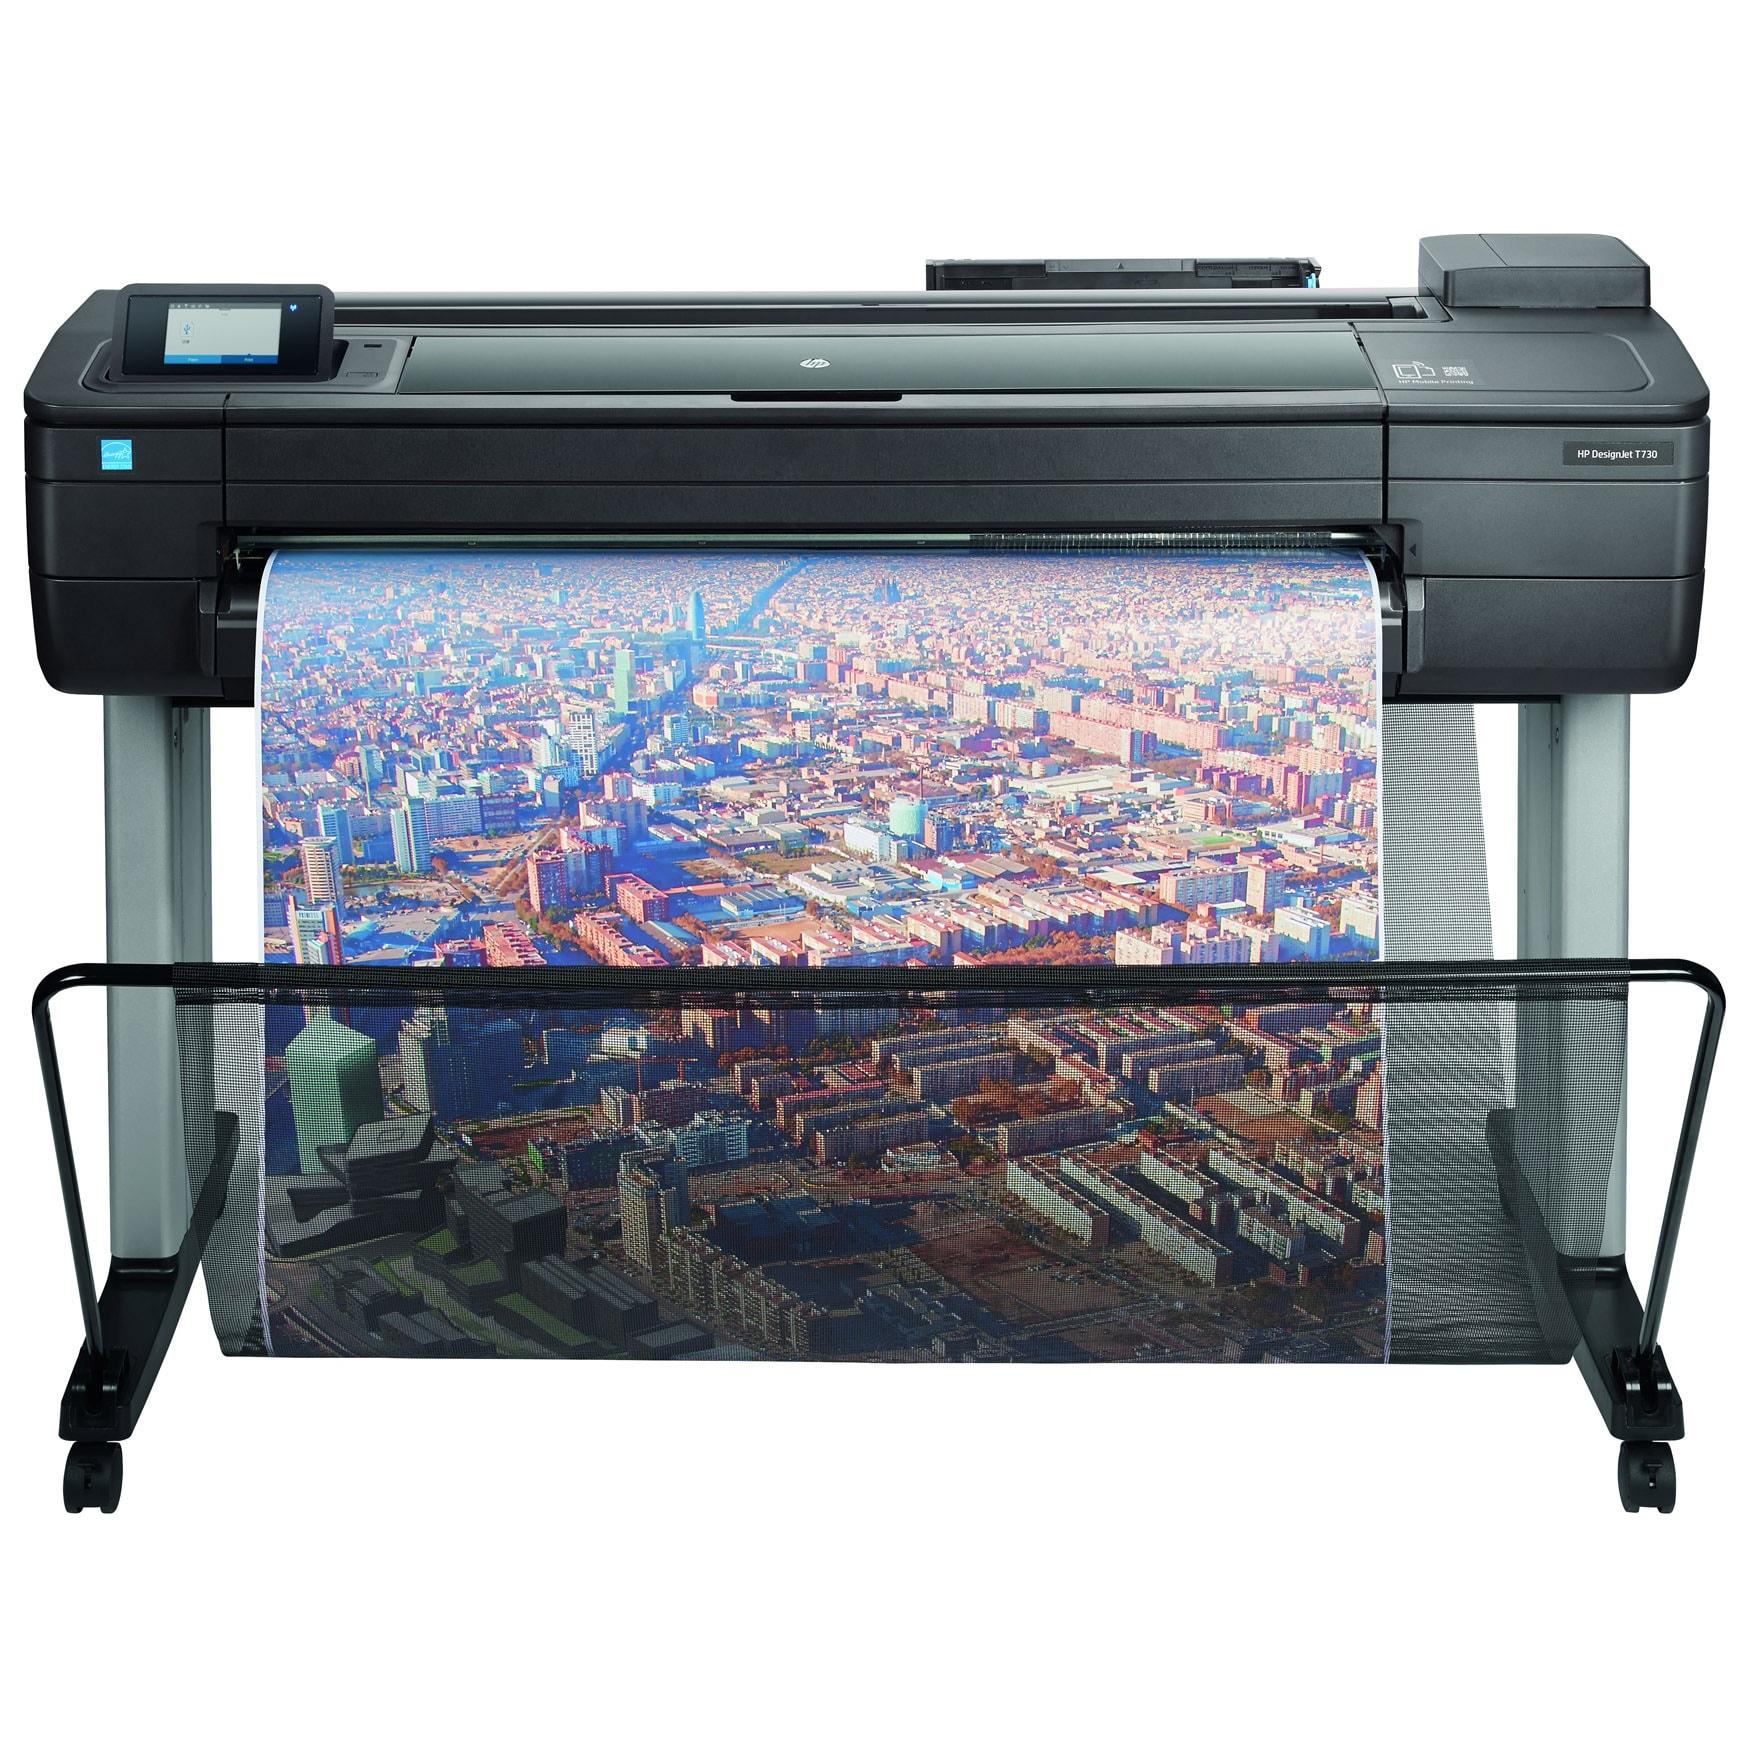 "Imprimante HP DesignJet T730 36"" - Cybertek.fr - 0"